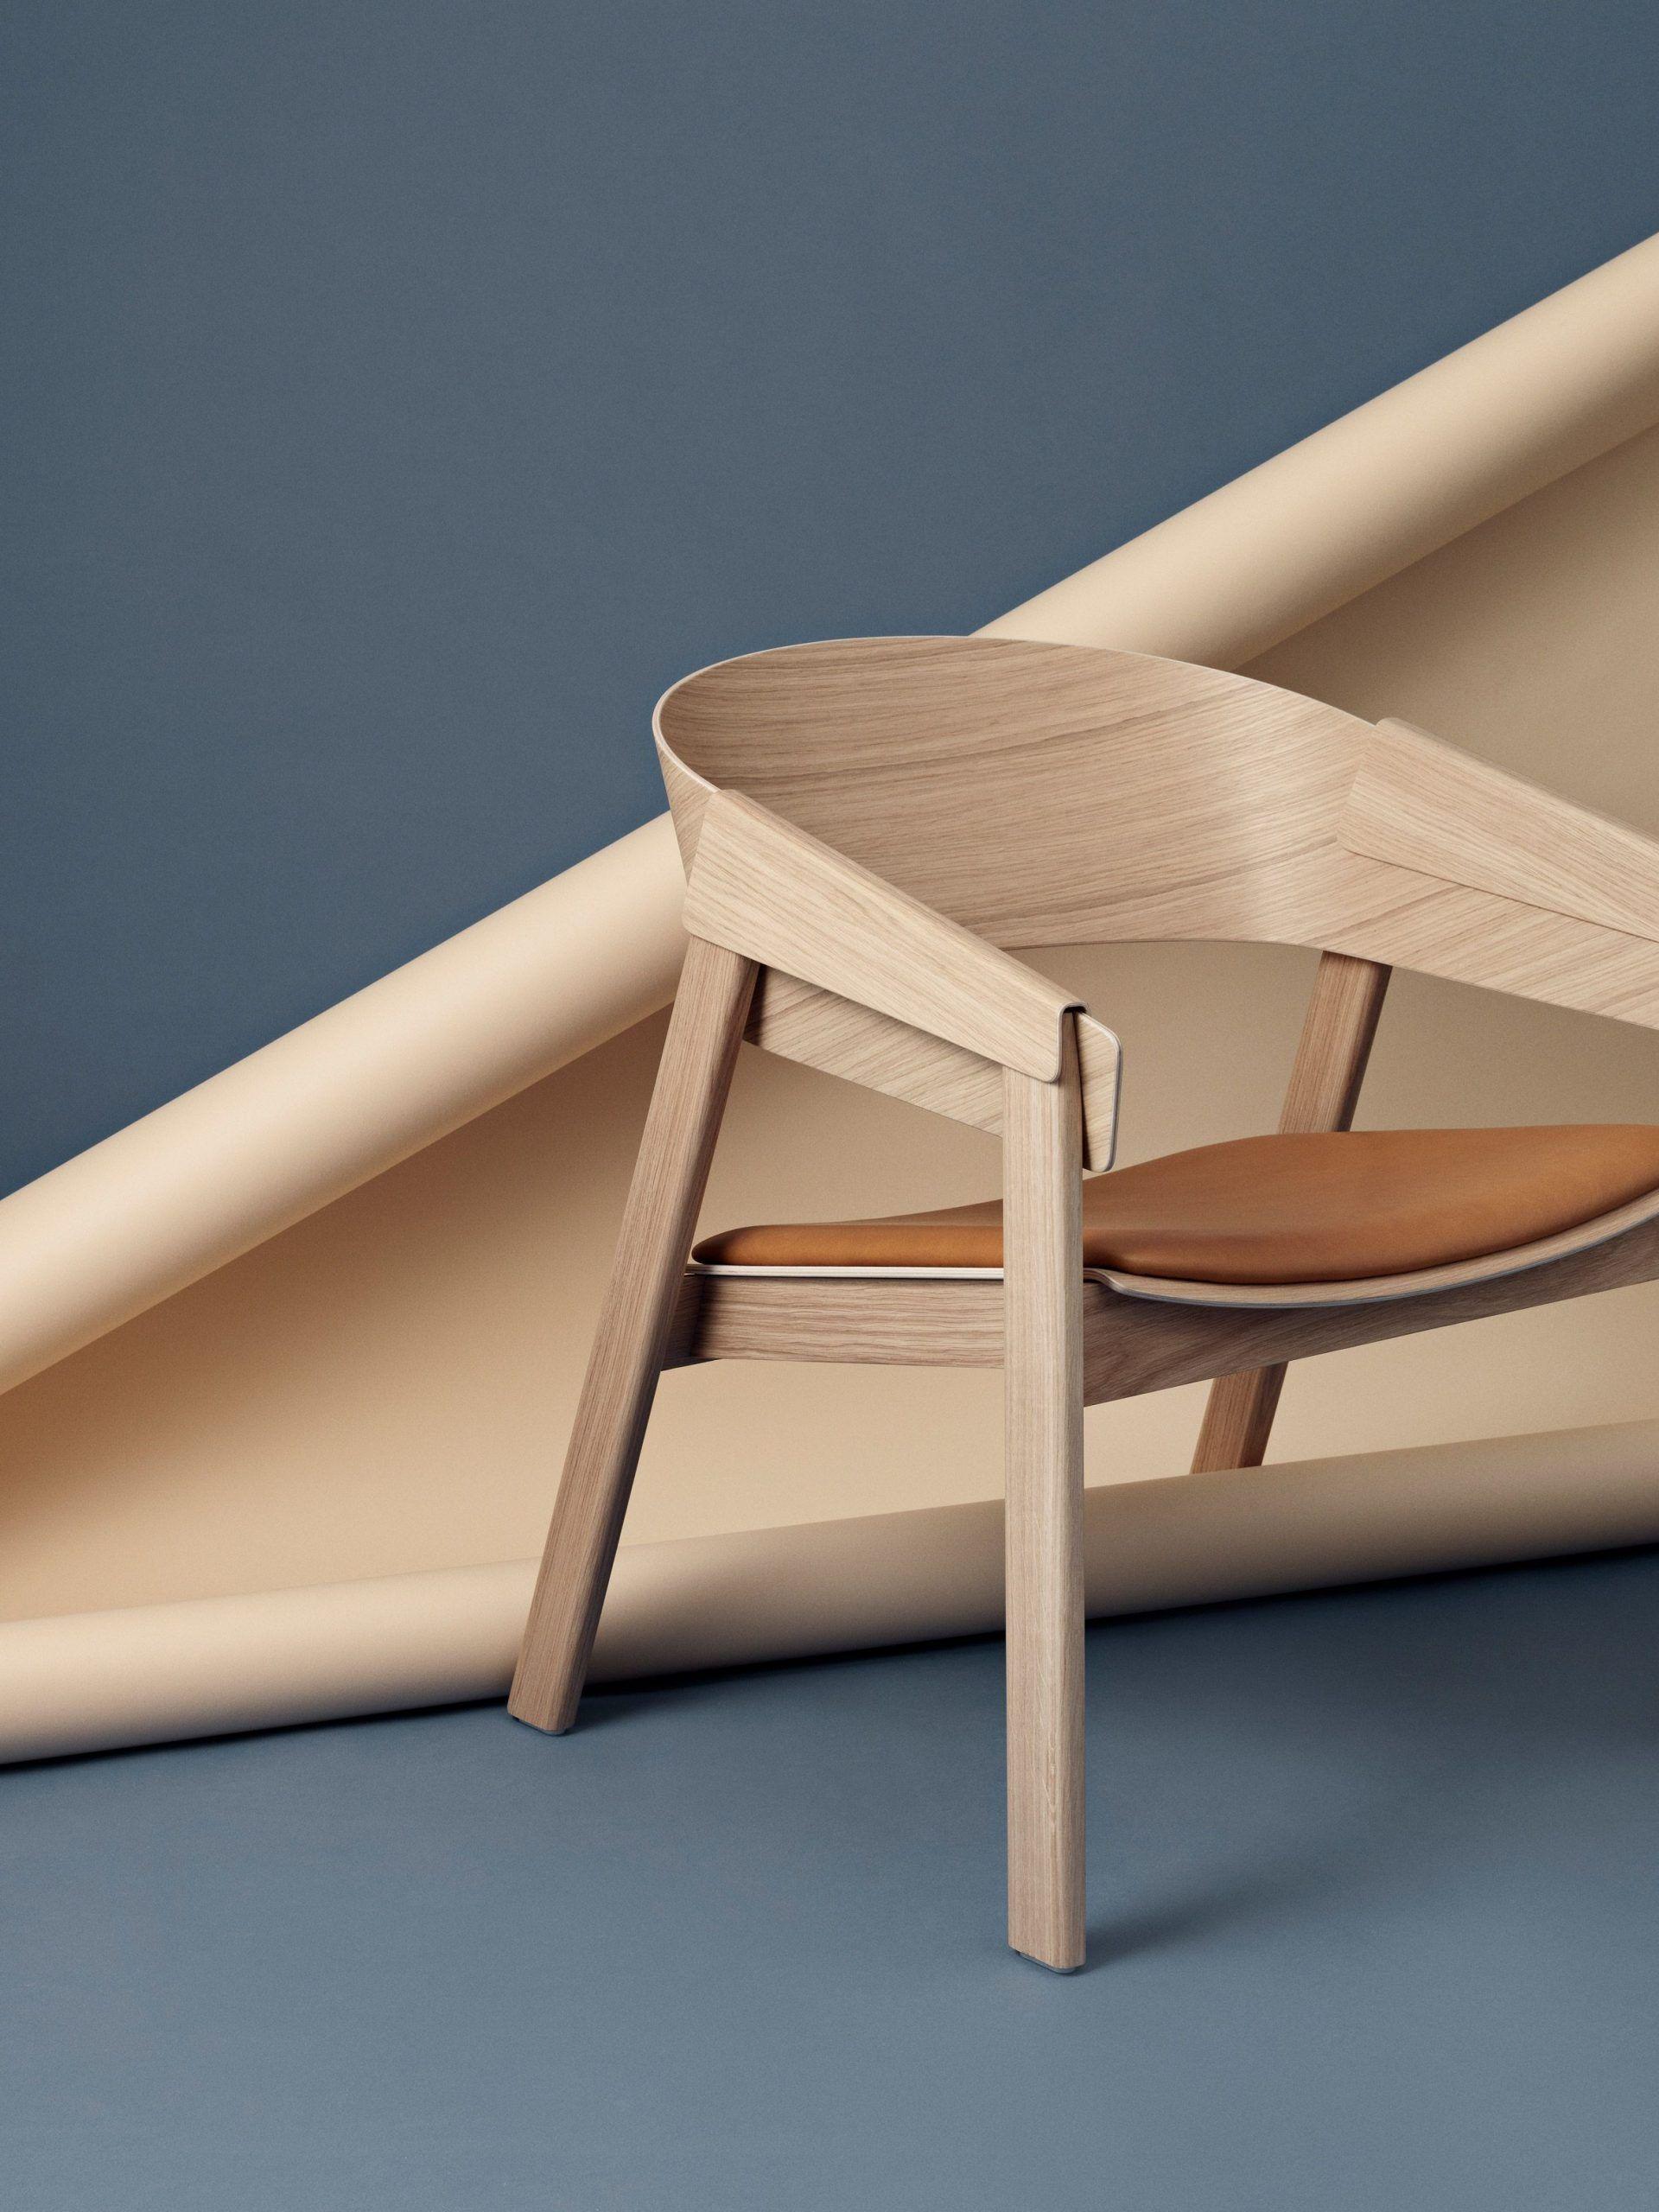 Thomas Bentzen S All Wood Cover Lounge Chair For Muuto Channels Scandinavian Design In 2020 Wooden Lounge Chair Scandinavian Chairs Chair Design